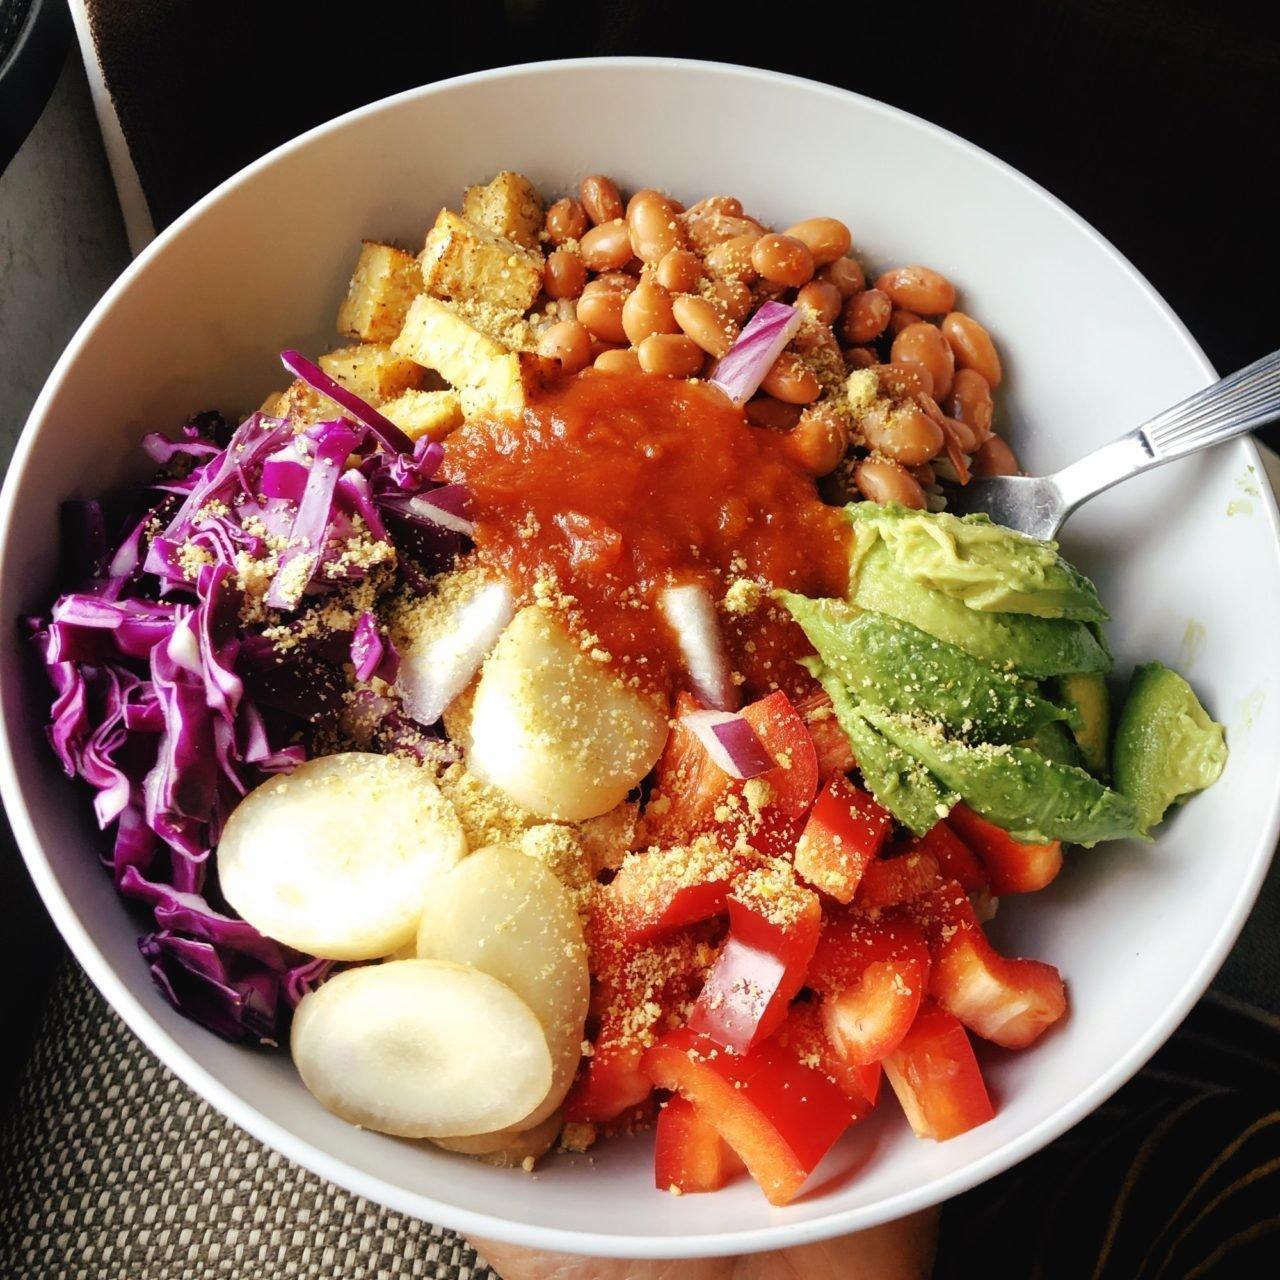 easy bean burrito bowl in a grey plastic bowl.